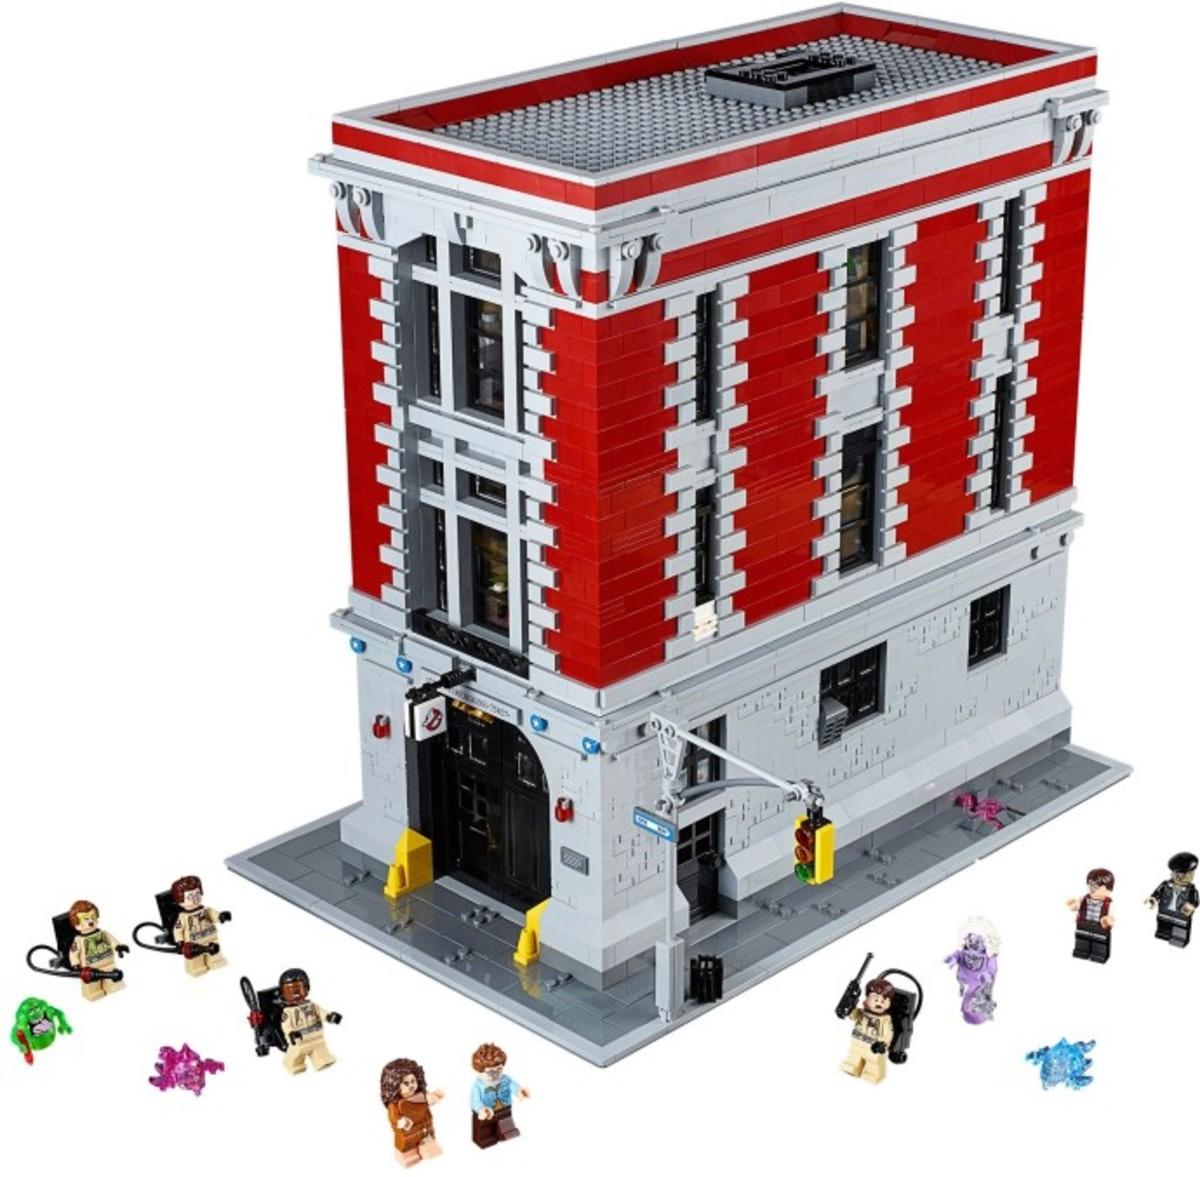 LEGO Firehouse Headquarters